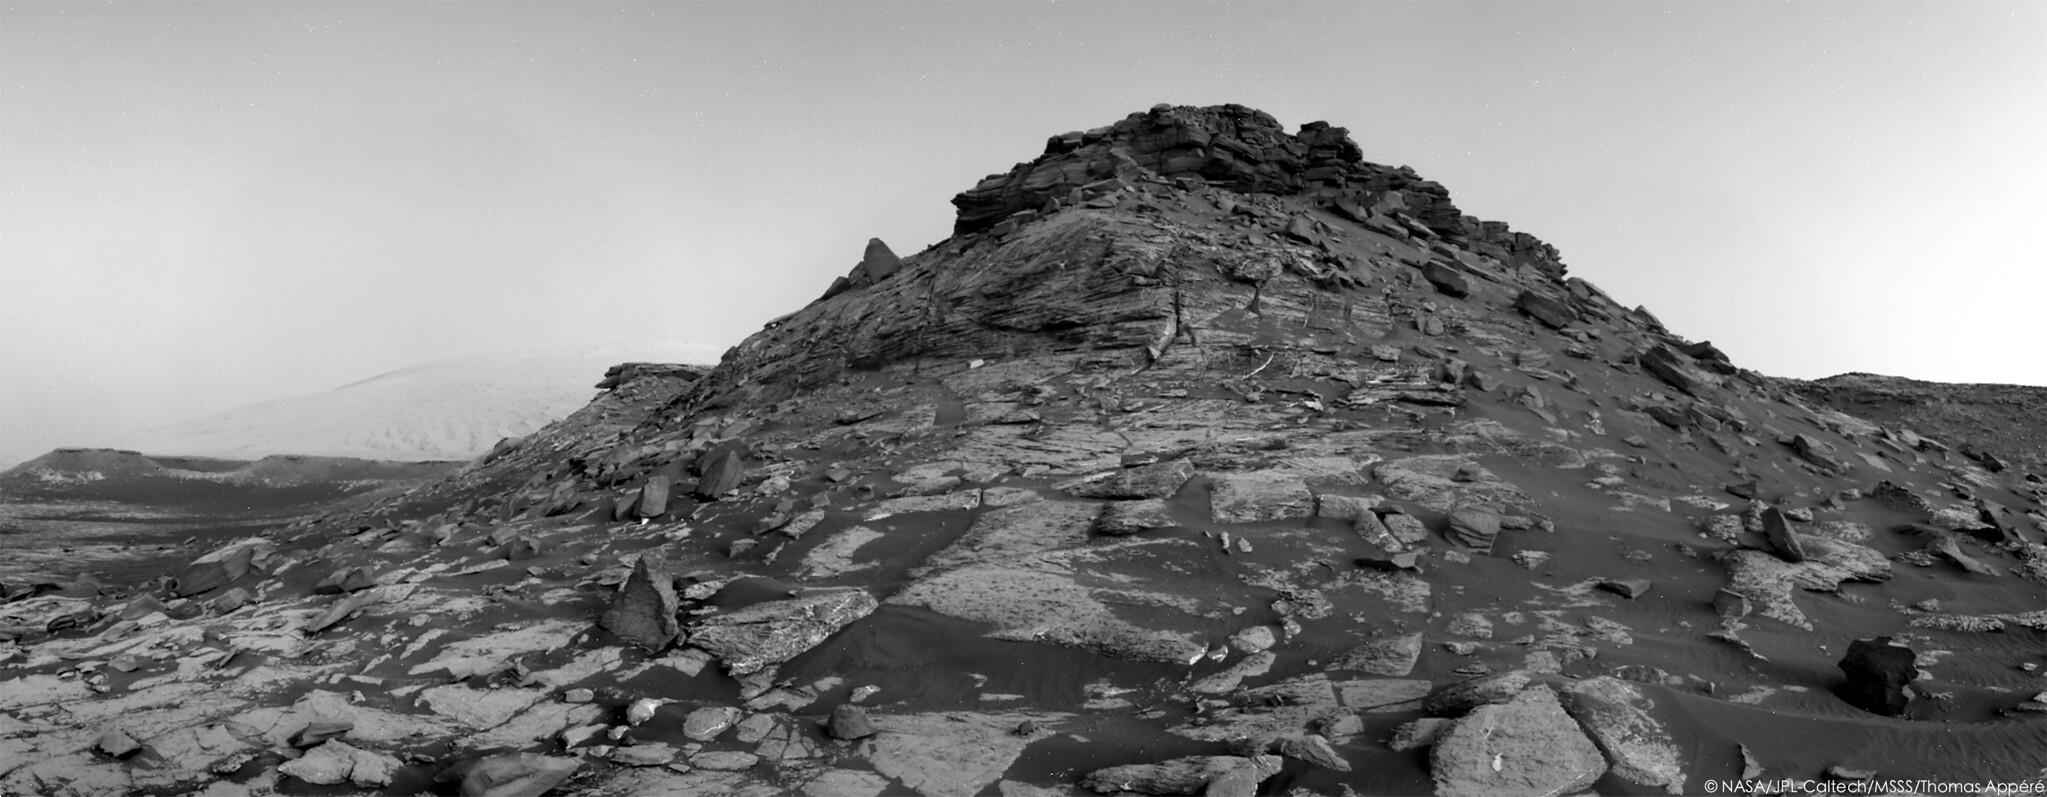 [Curiosity/MSL] L'exploration du cratère Gale (3/3) - Page 5 EWcvKlOWkAA7oYV?format=jpg&name=large